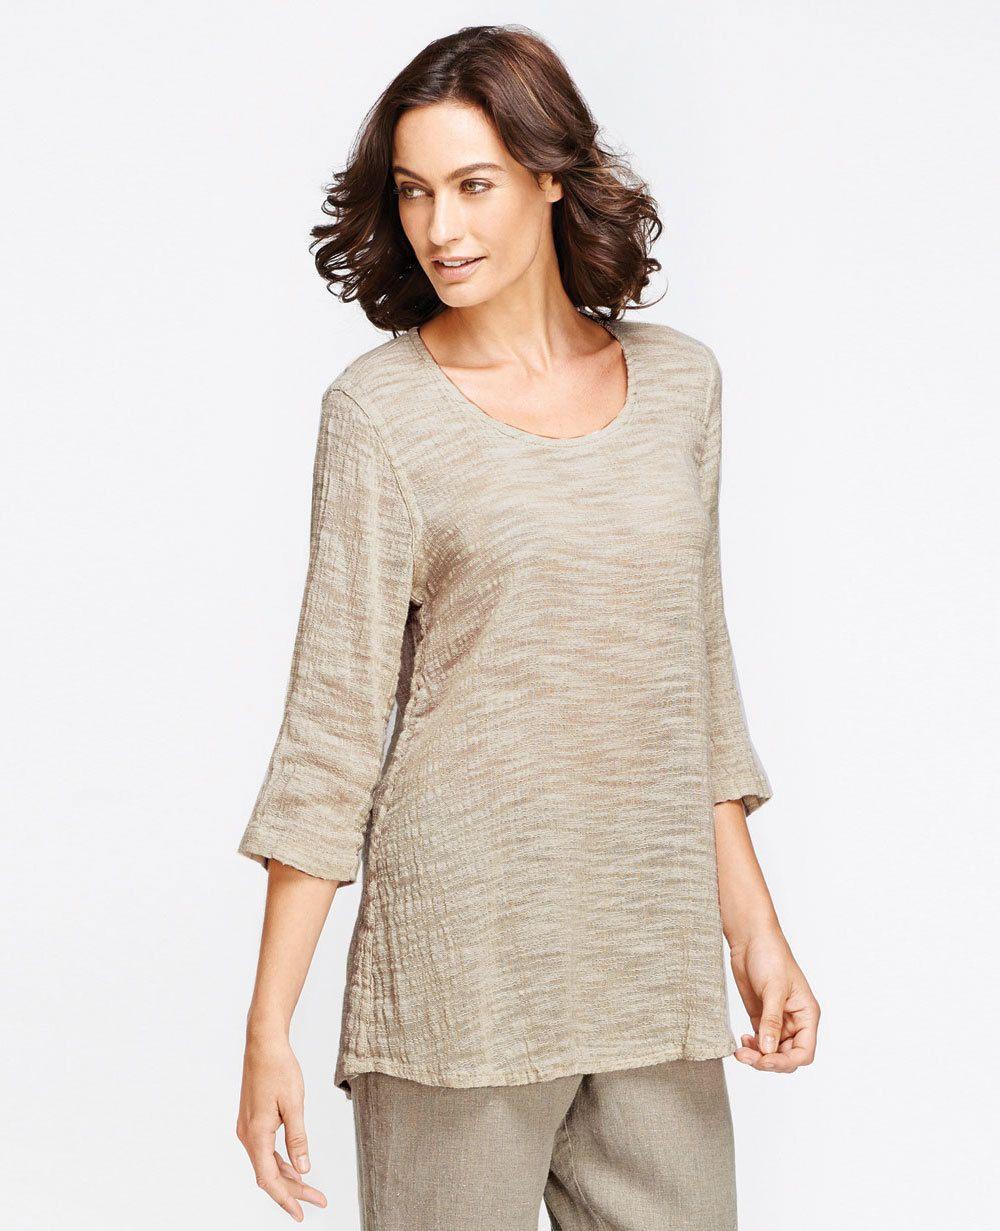 FLAX Design FLAX Select 2015 Sweeping 3/4 Tee   Fg Clothing #flaxdesign women's linen sweeping, flowy tee #linentee